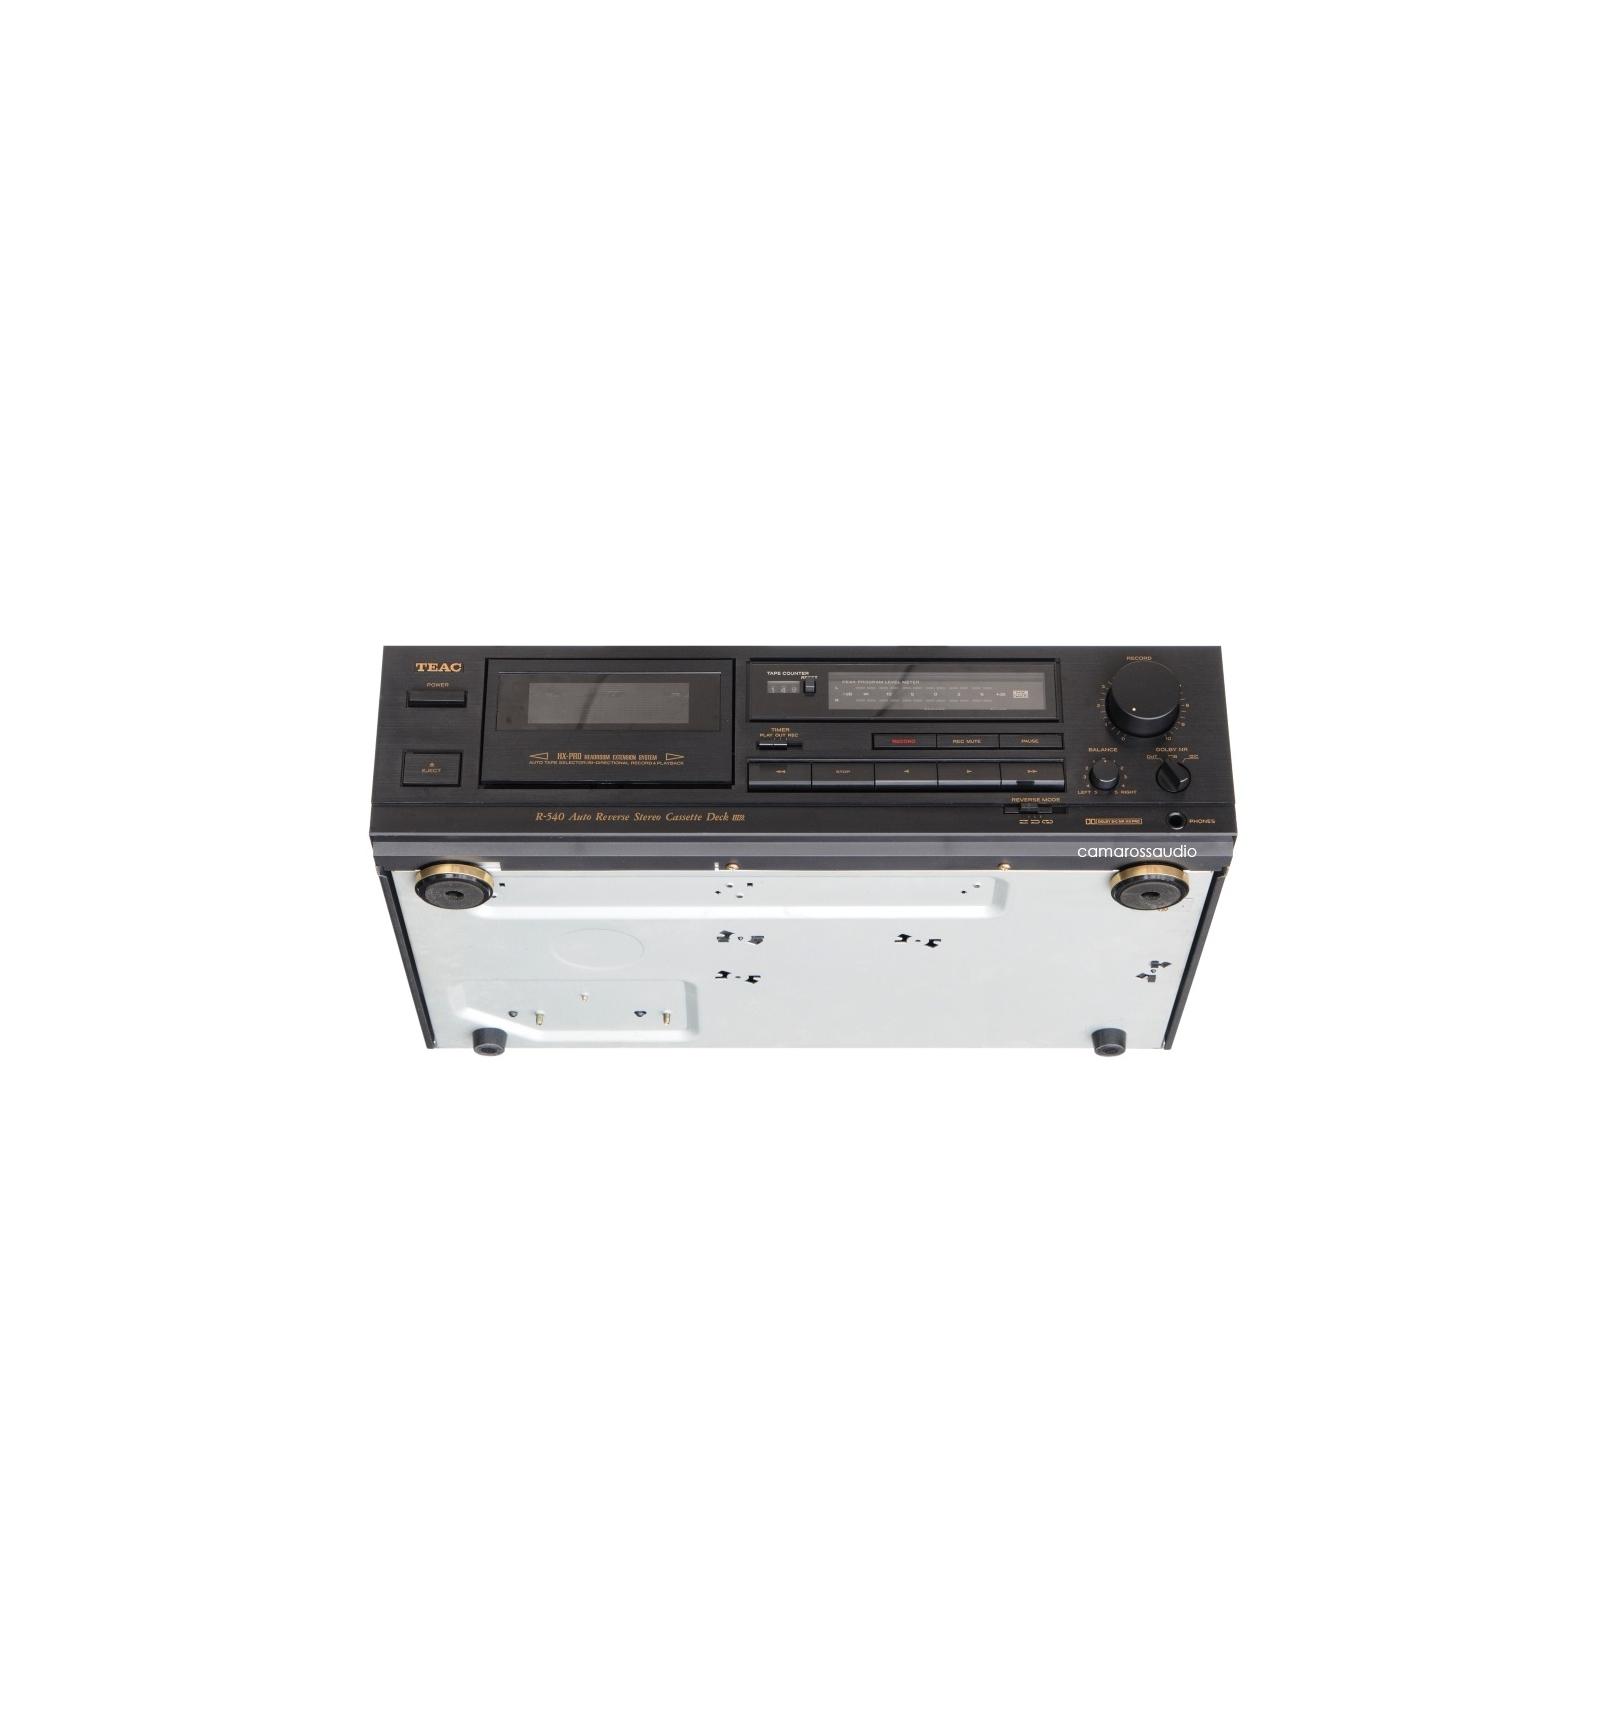 Teacr540  Teacv 540  R540  Cassettedeck  Teac  2head  2motor  Tape